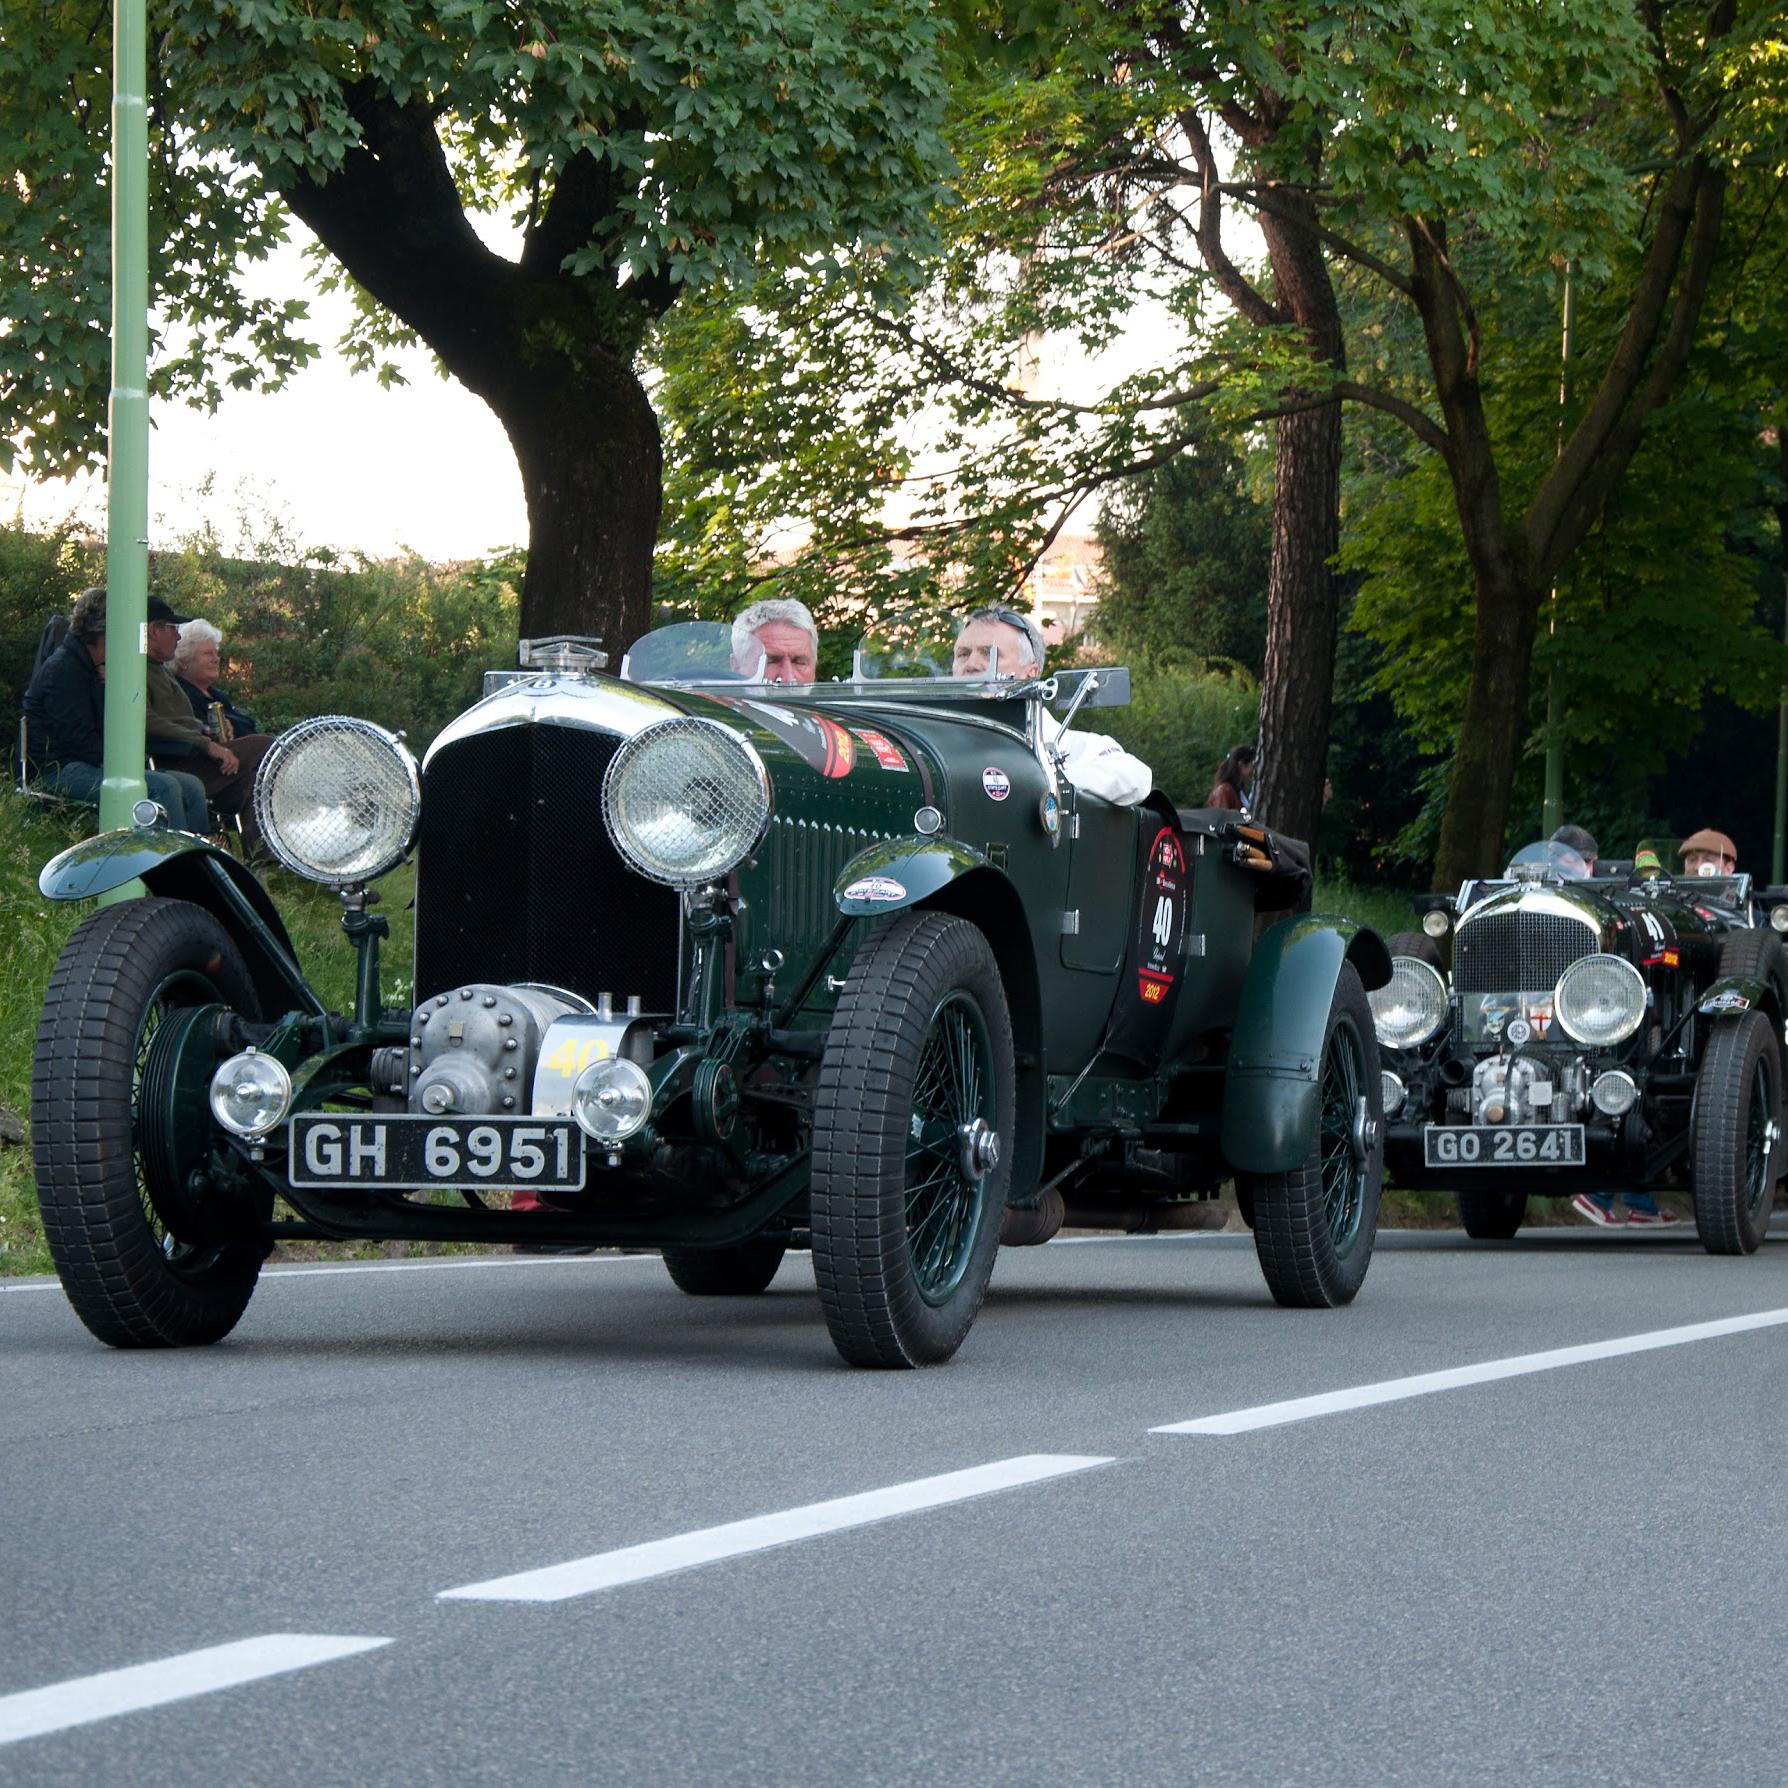 footman-james-vintage-car-insurance-2.jpg